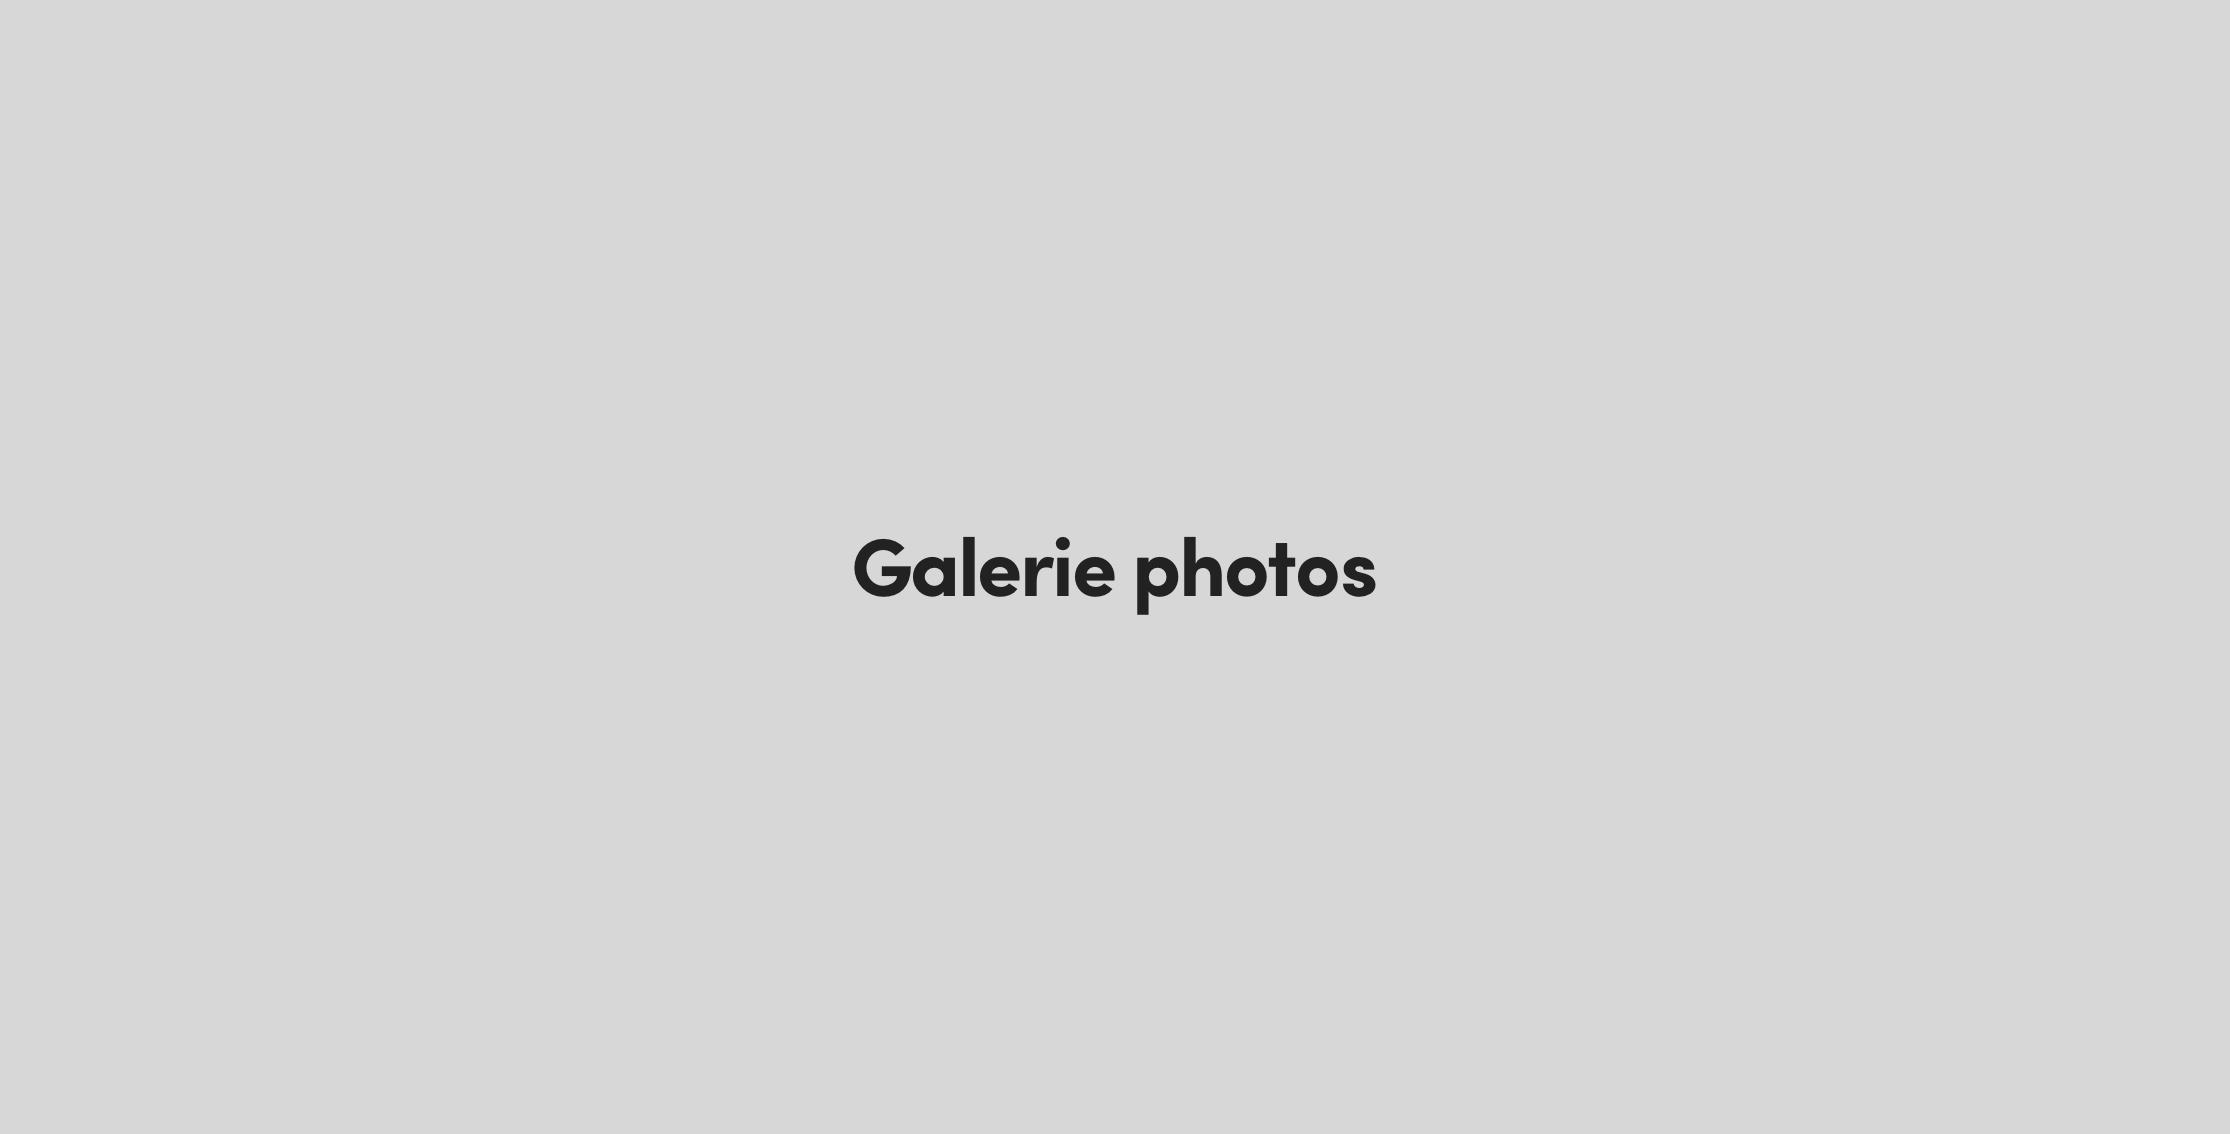 placeholder_galerie_photos@2x